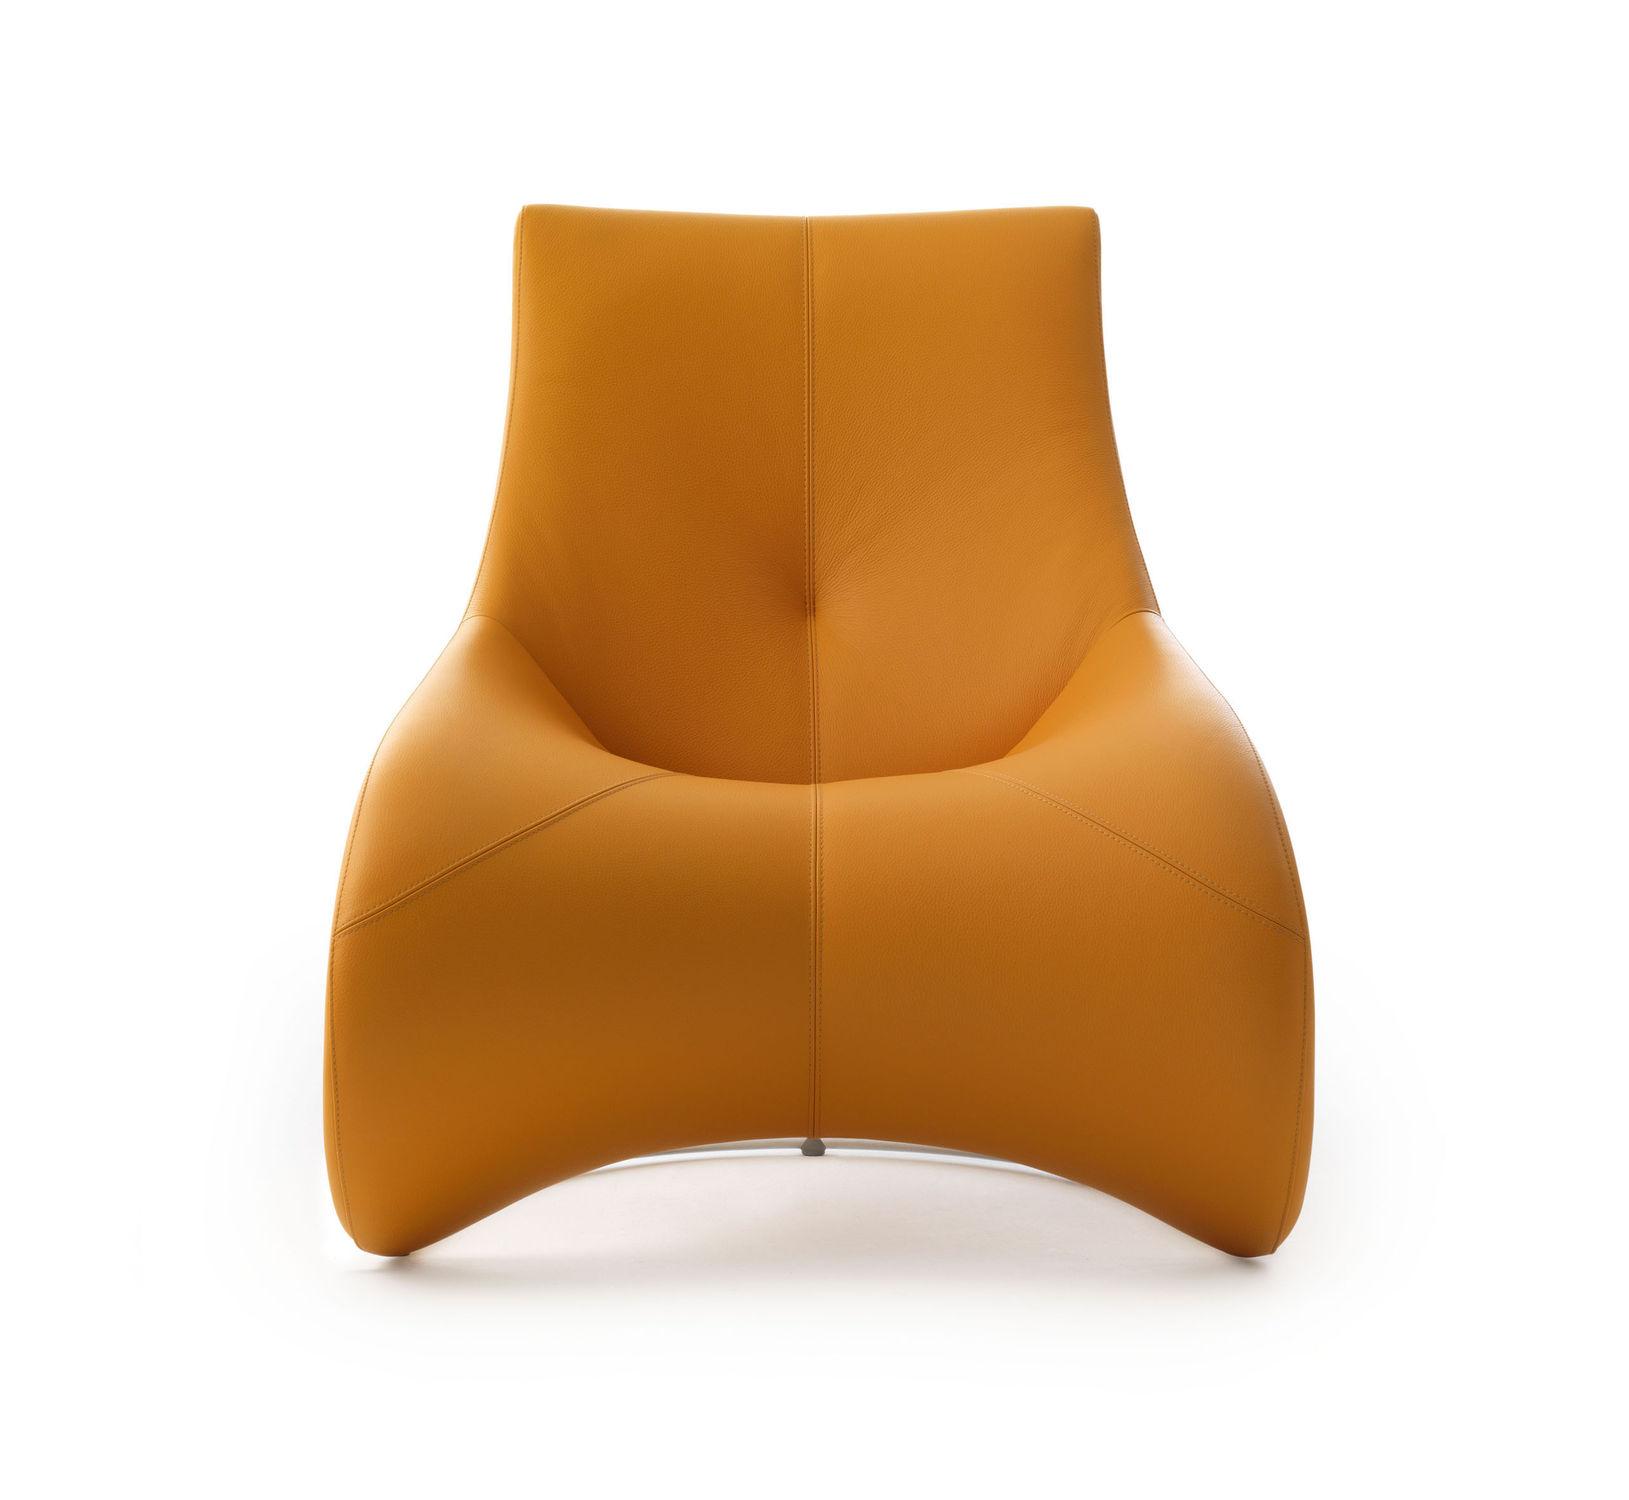 design darius by jan armgardt framboisemood. Black Bedroom Furniture Sets. Home Design Ideas